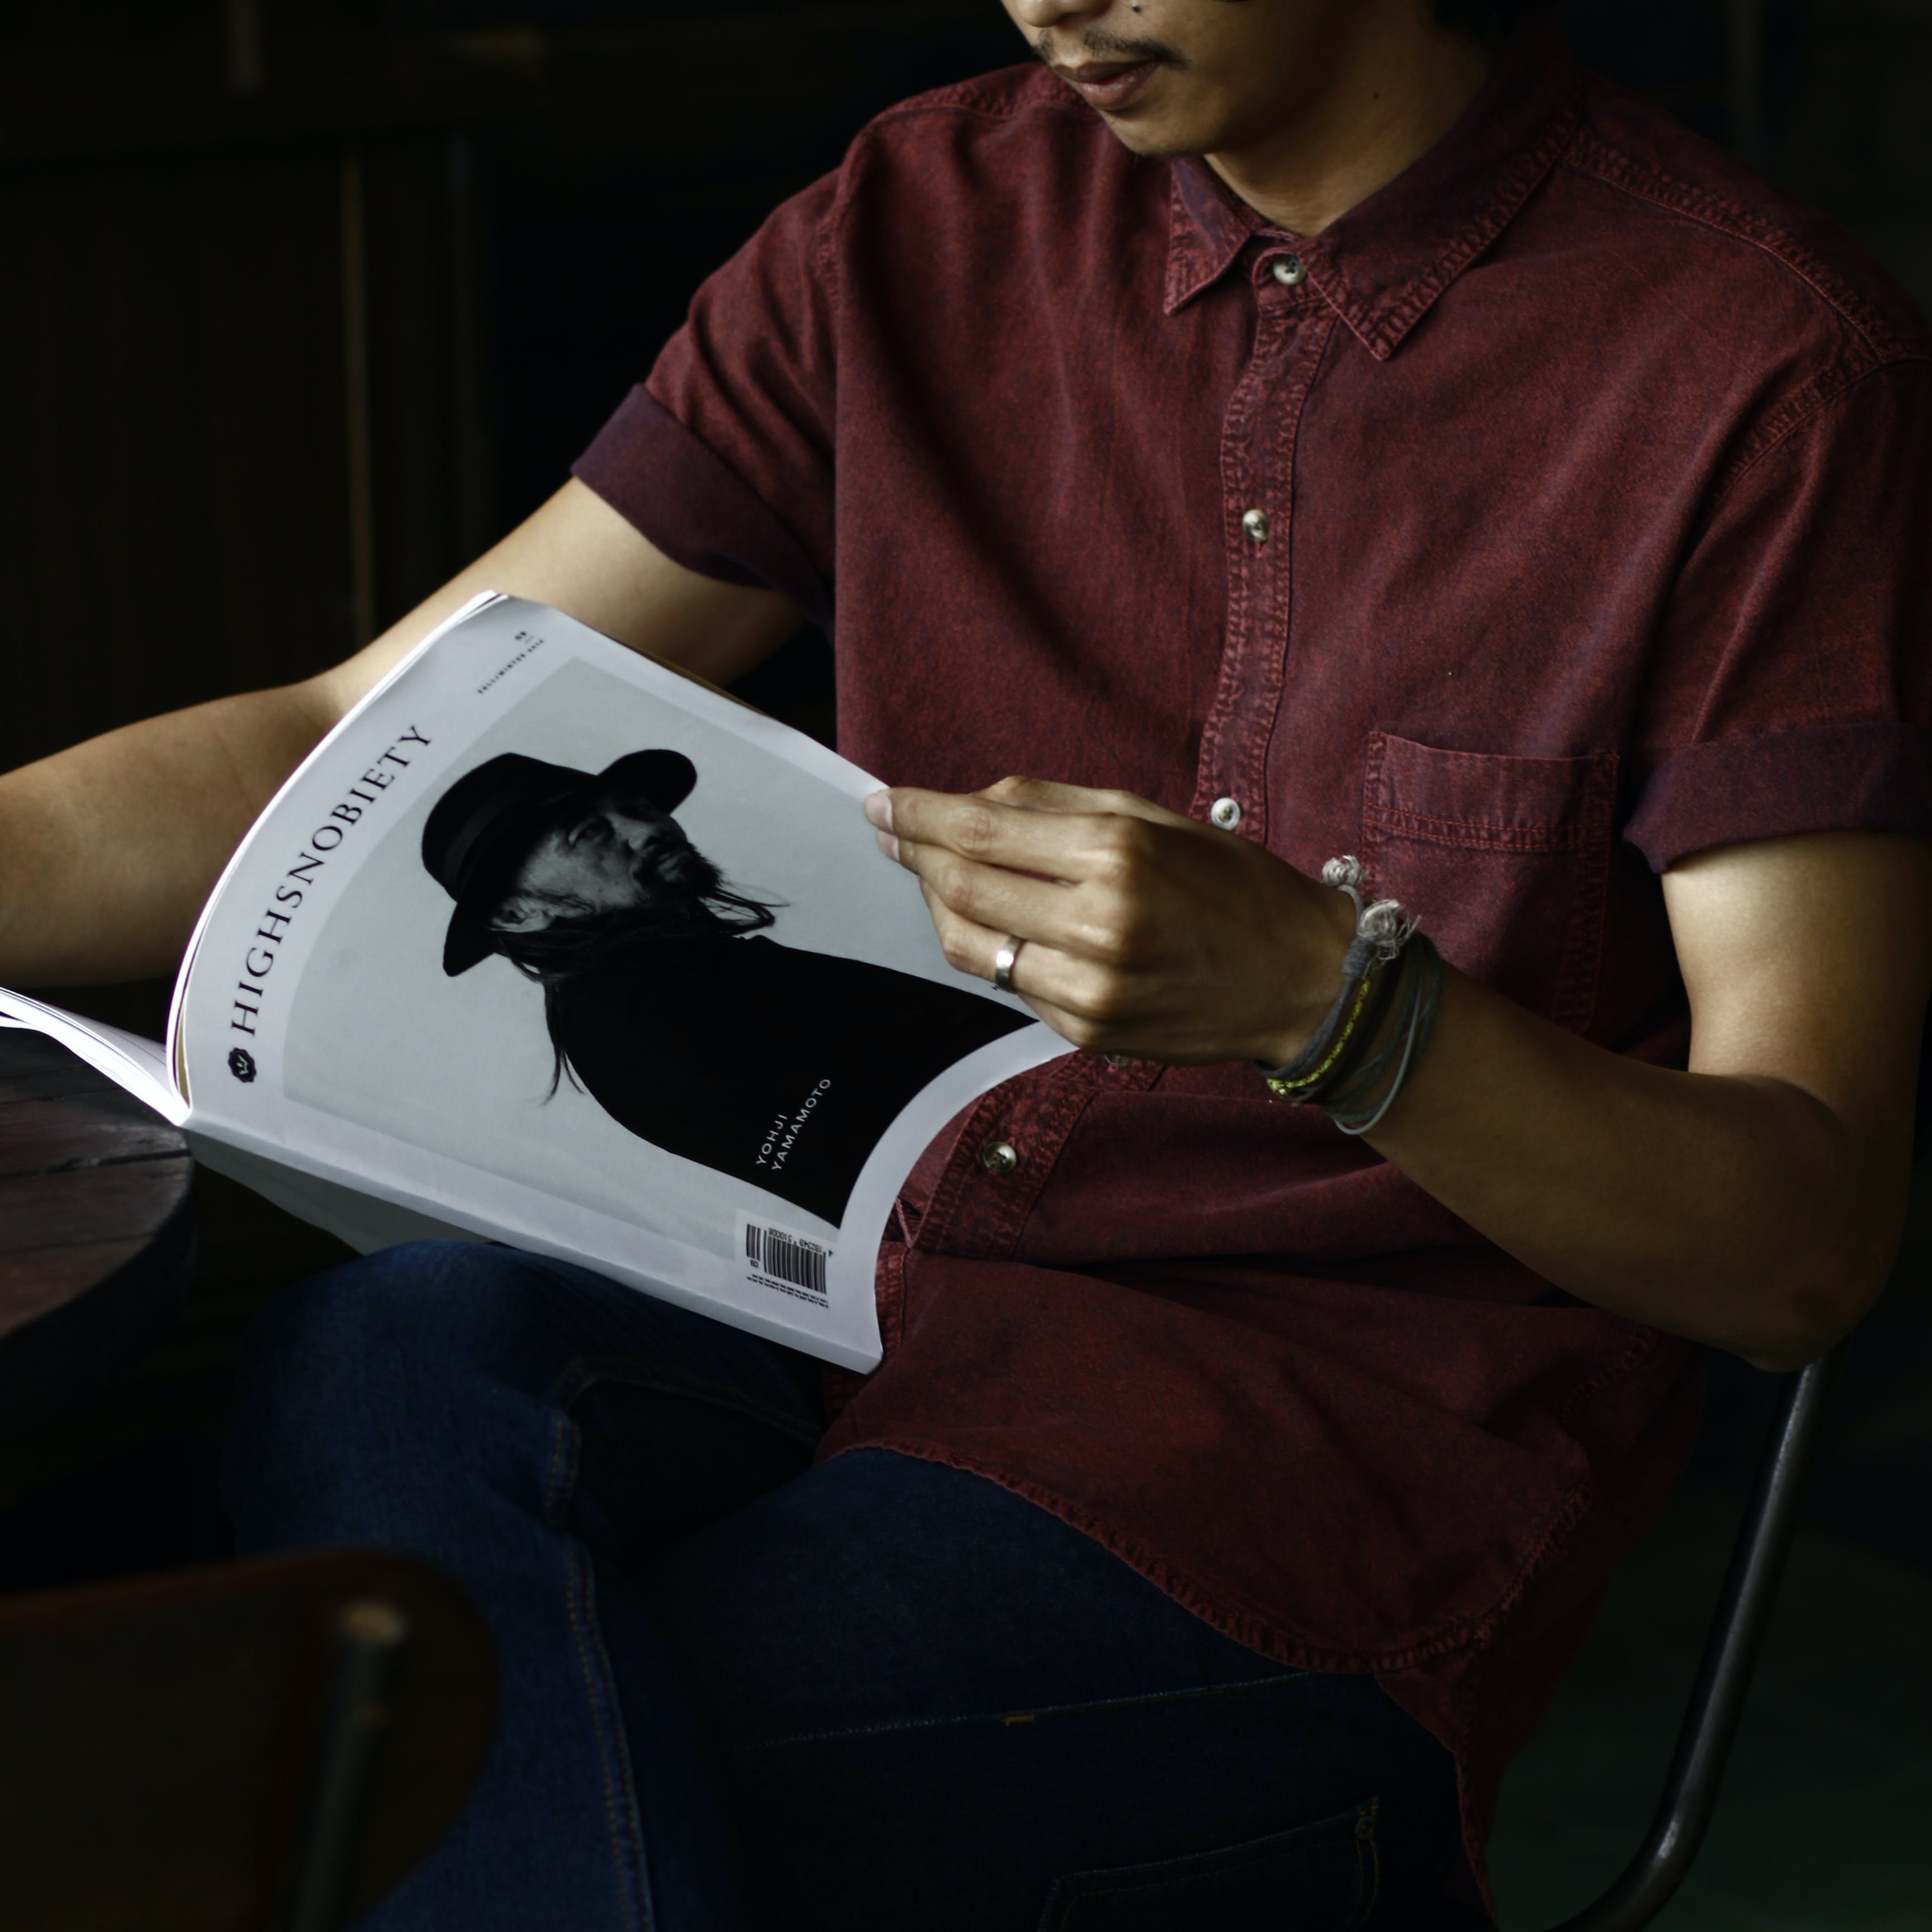 Man Holding Highnoblety Book